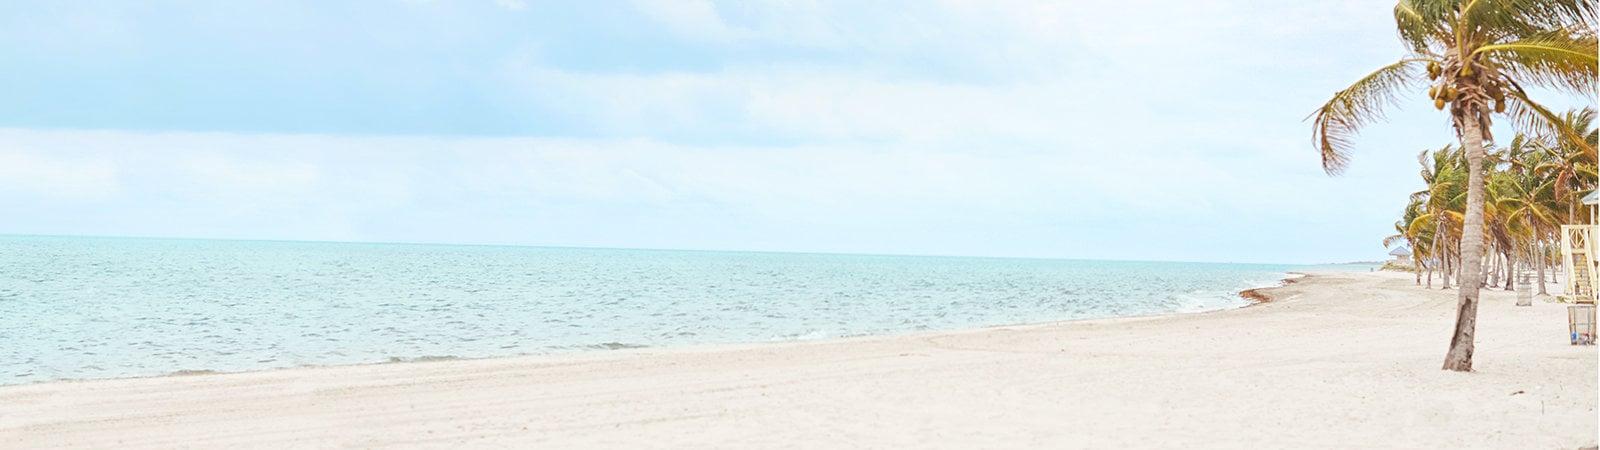 a16f408d3fd8 Lais Ribeiro's Summer Suitcase - Victoria's Secret Swim